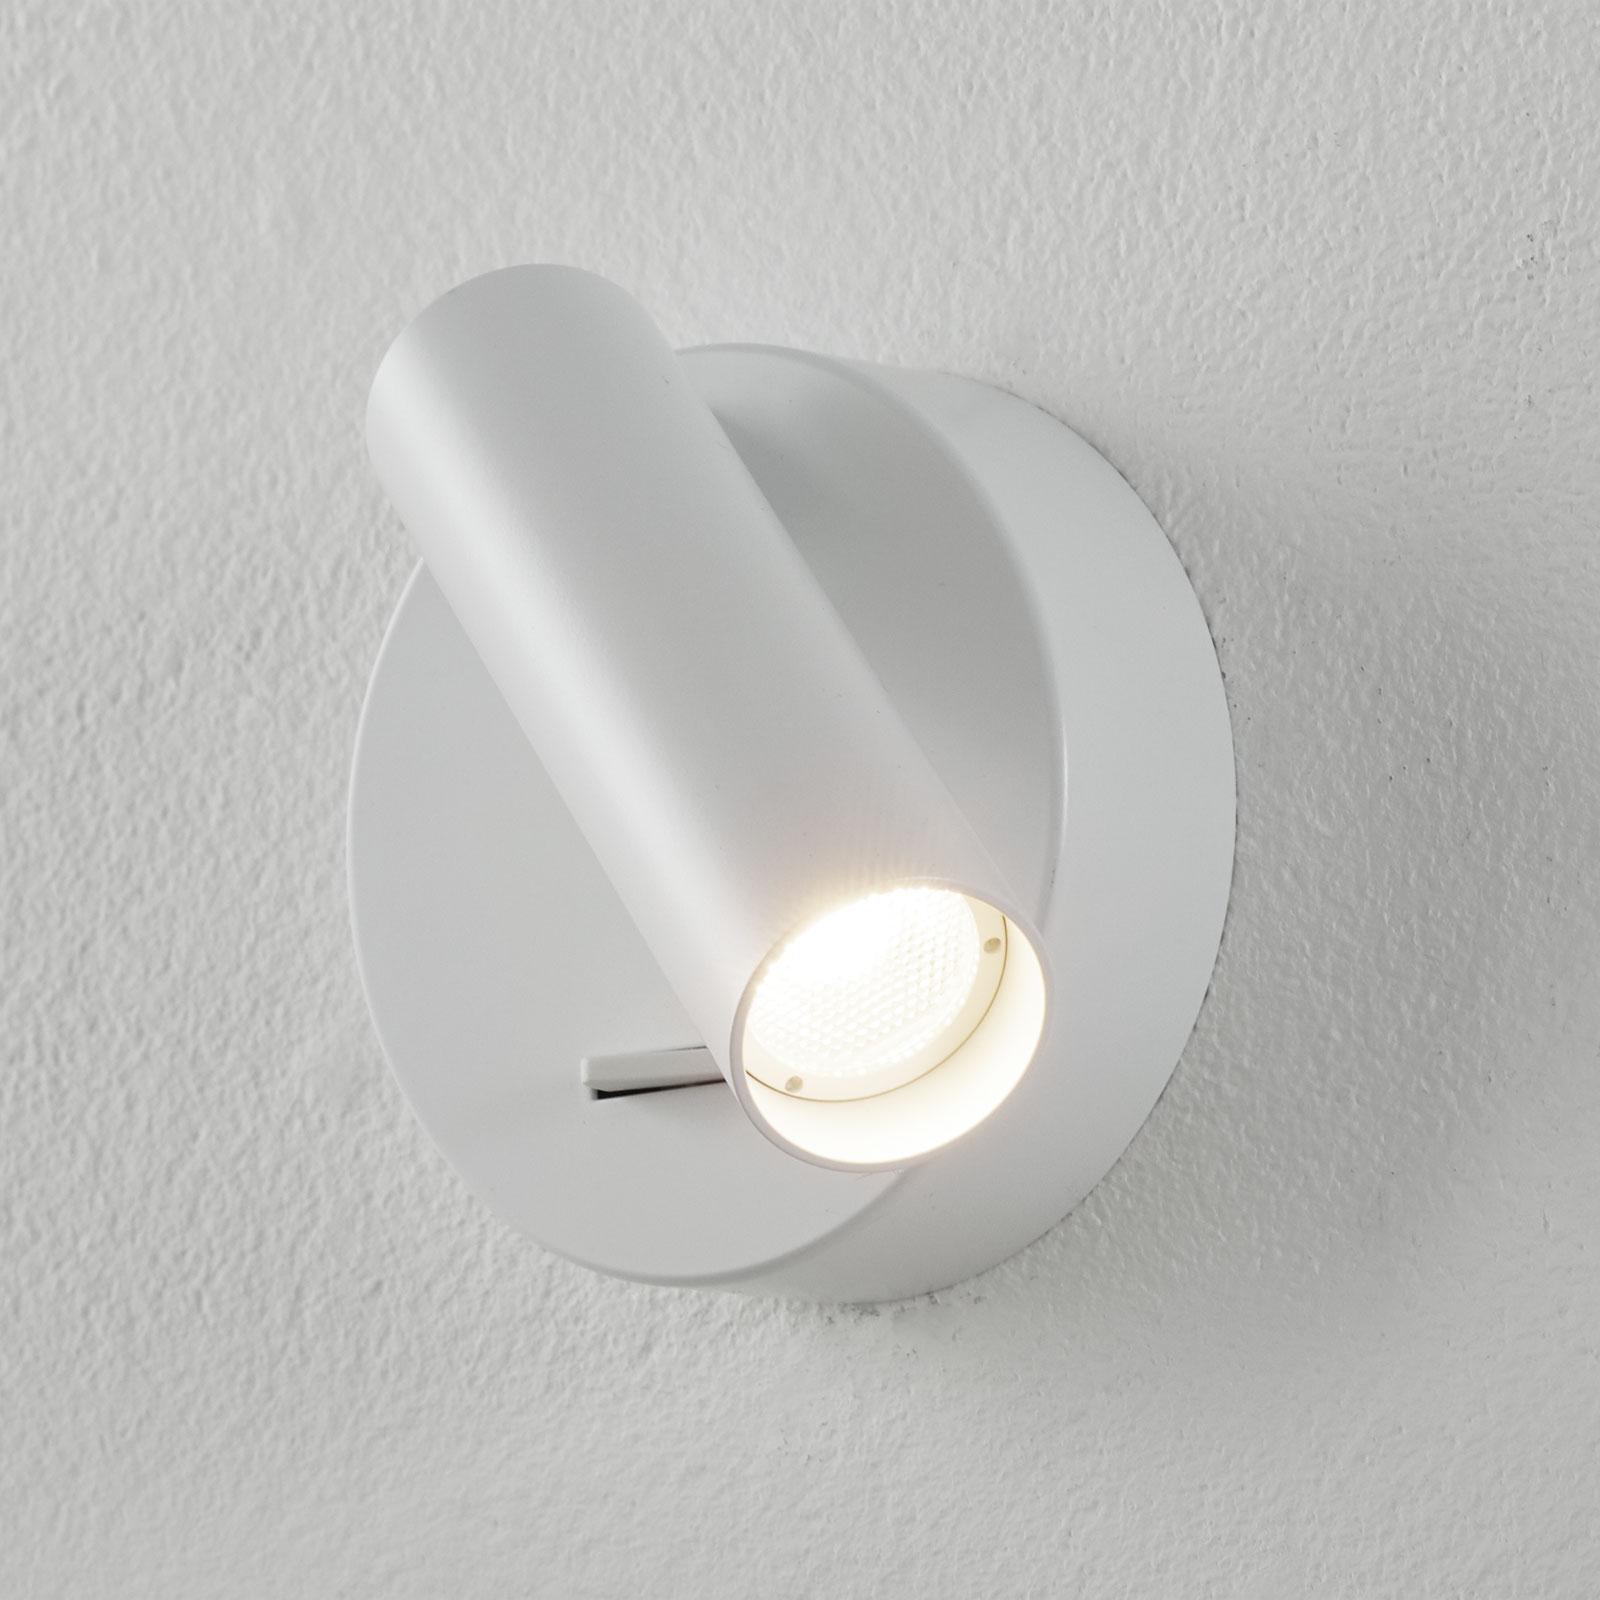 Arcchio Liani spot mural LED, blanc